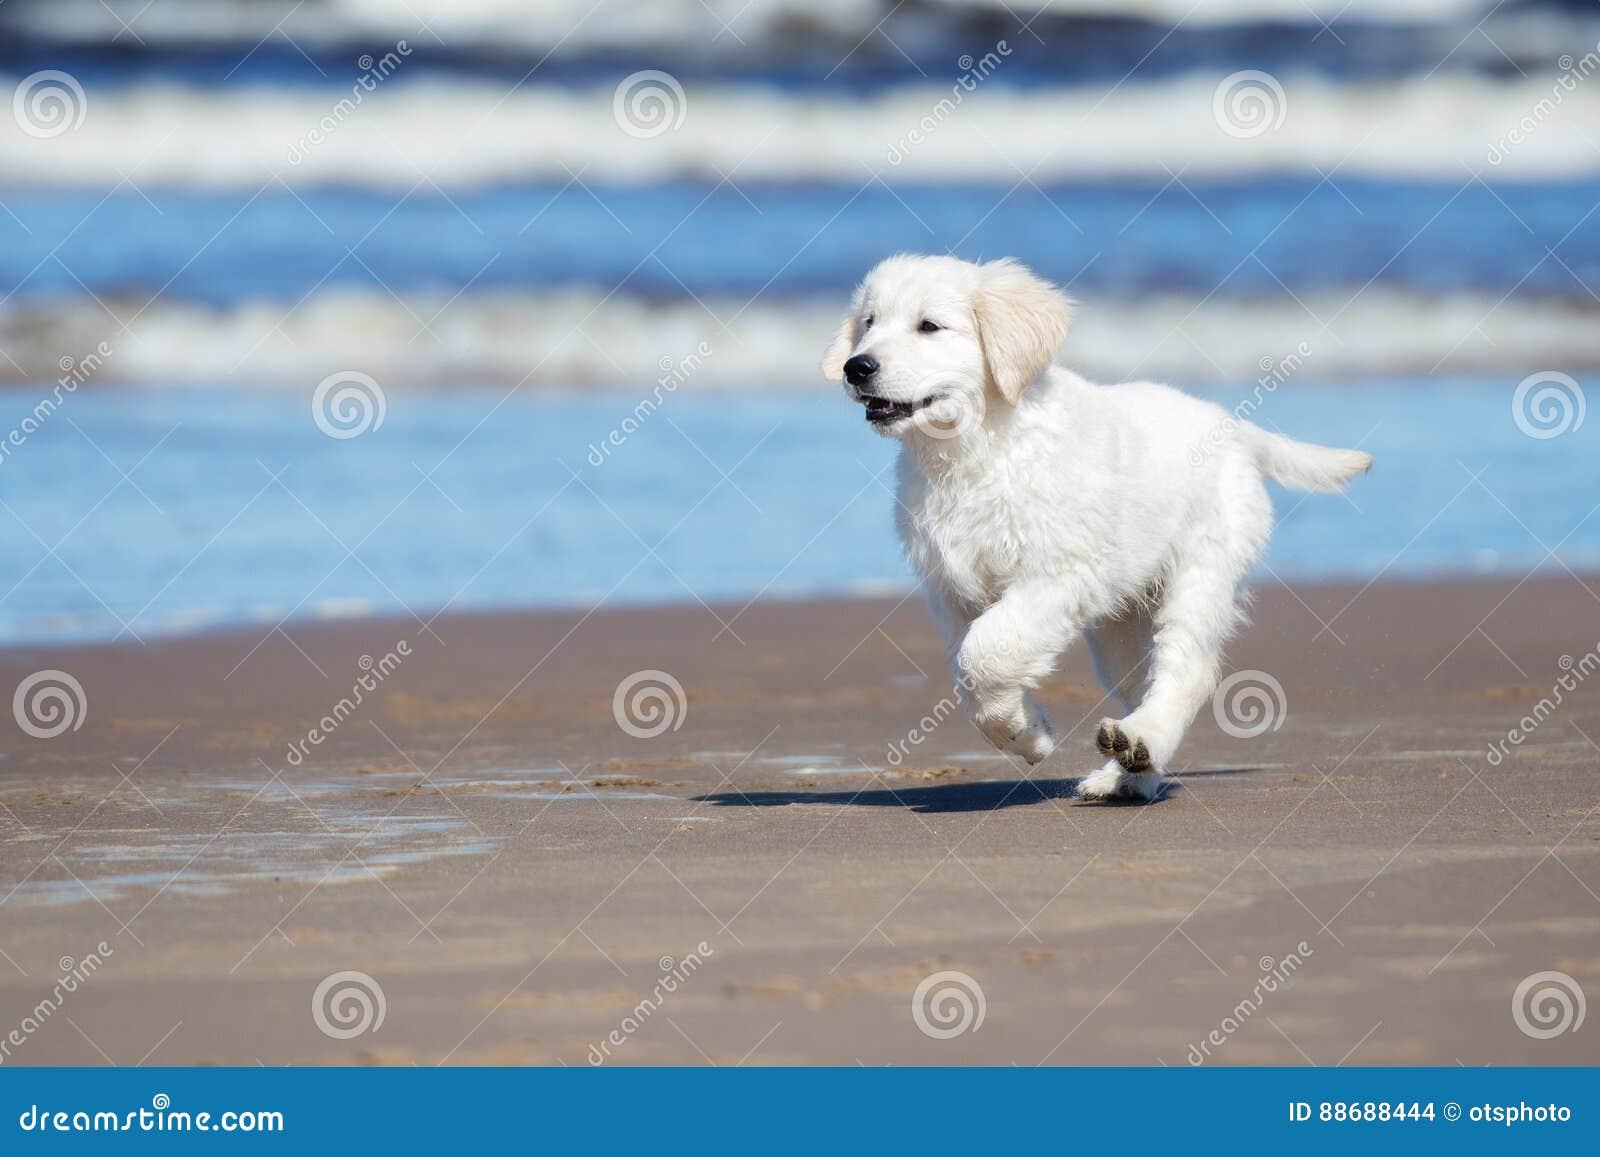 Adorable Golden Retriever Puppy On A Beach Stock Photo Image Of Sweet Summer 88688444